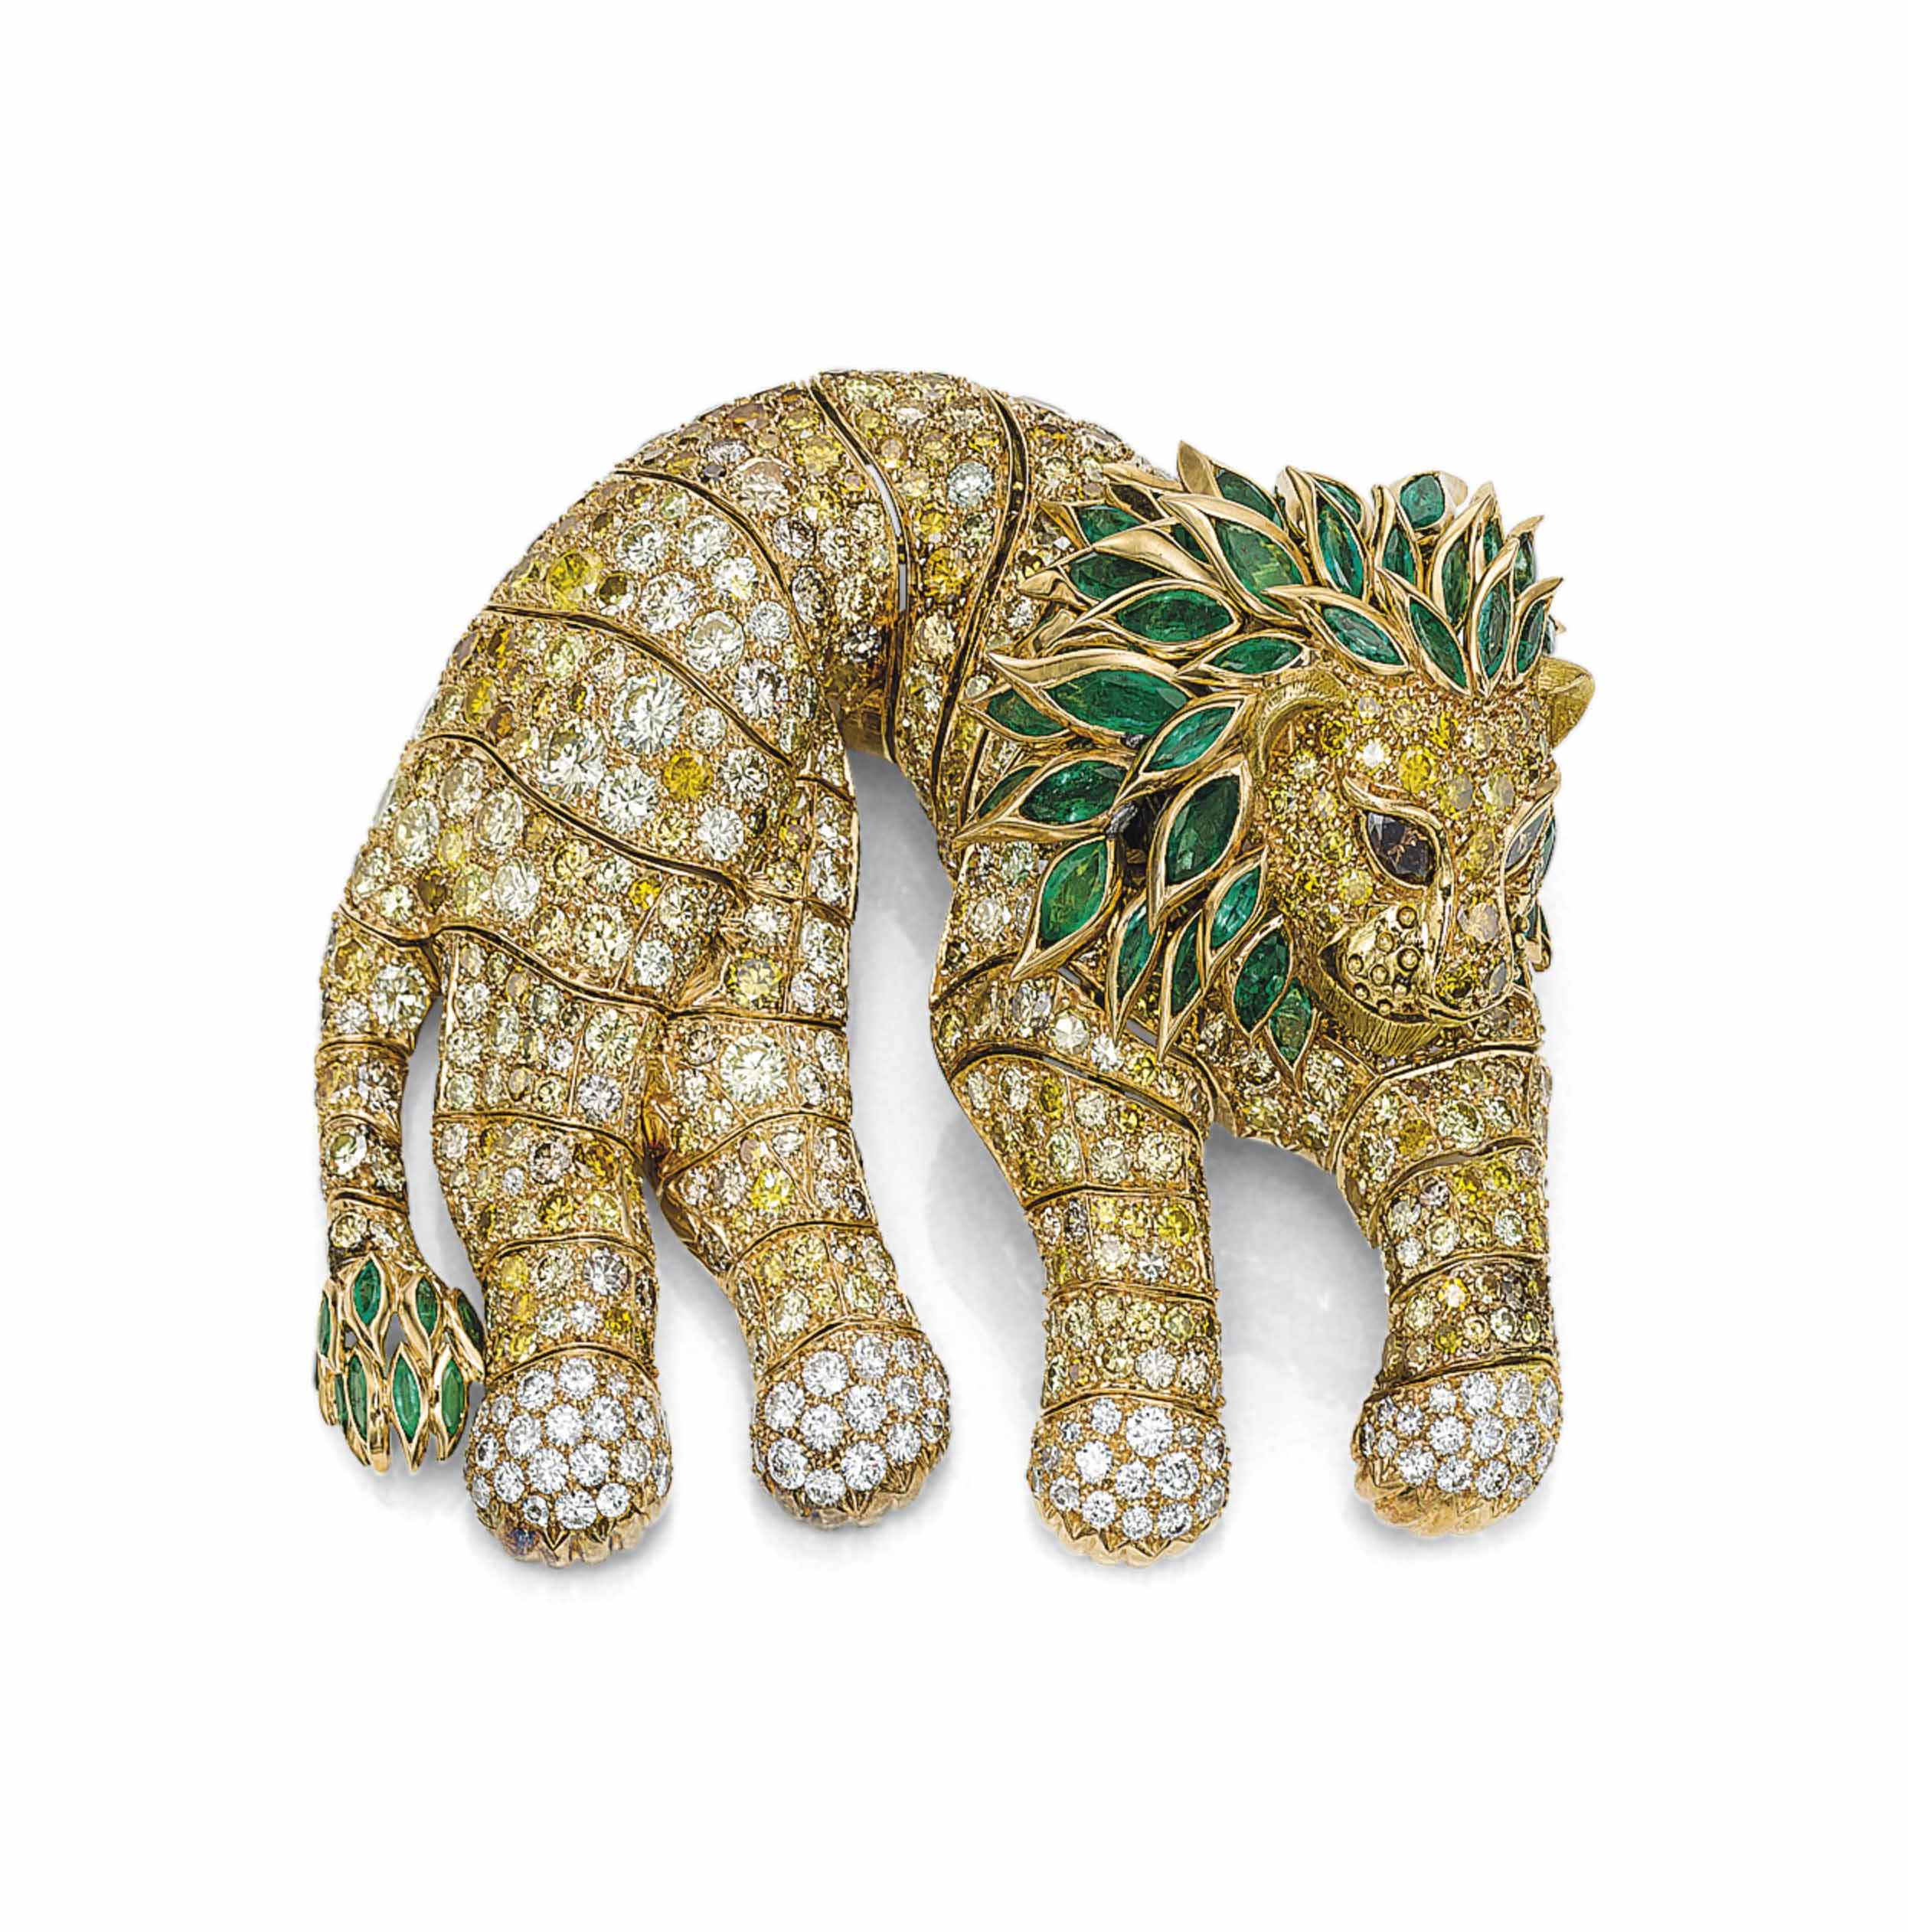 A COLOURED DIAMOND, DIAMOND AND EMERALD LION SHOULDER BROOCH, BY RENÉ BOIVIN